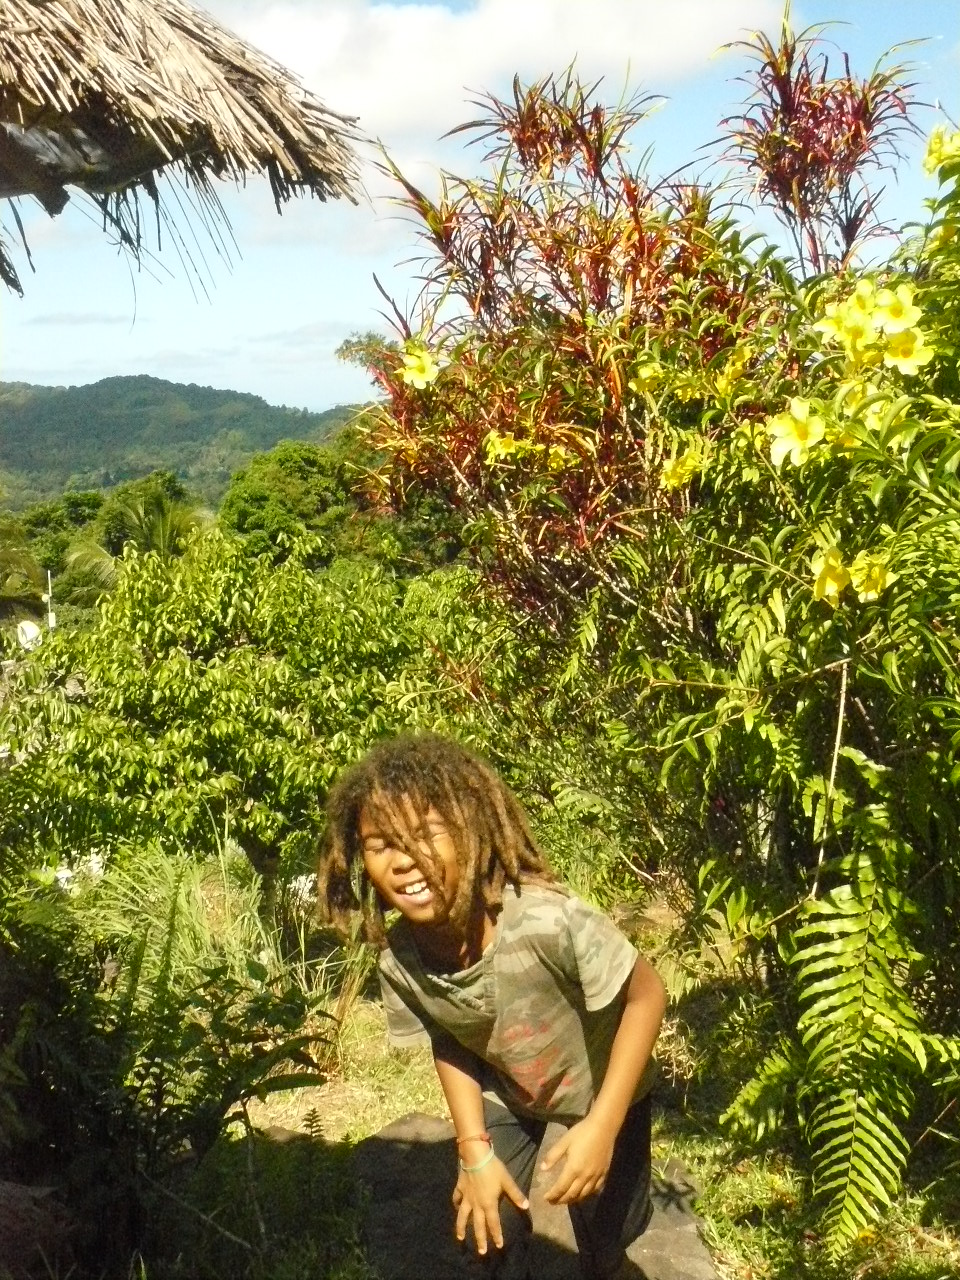 Mayotte_Combani_Relais Forestier_Tijah_21